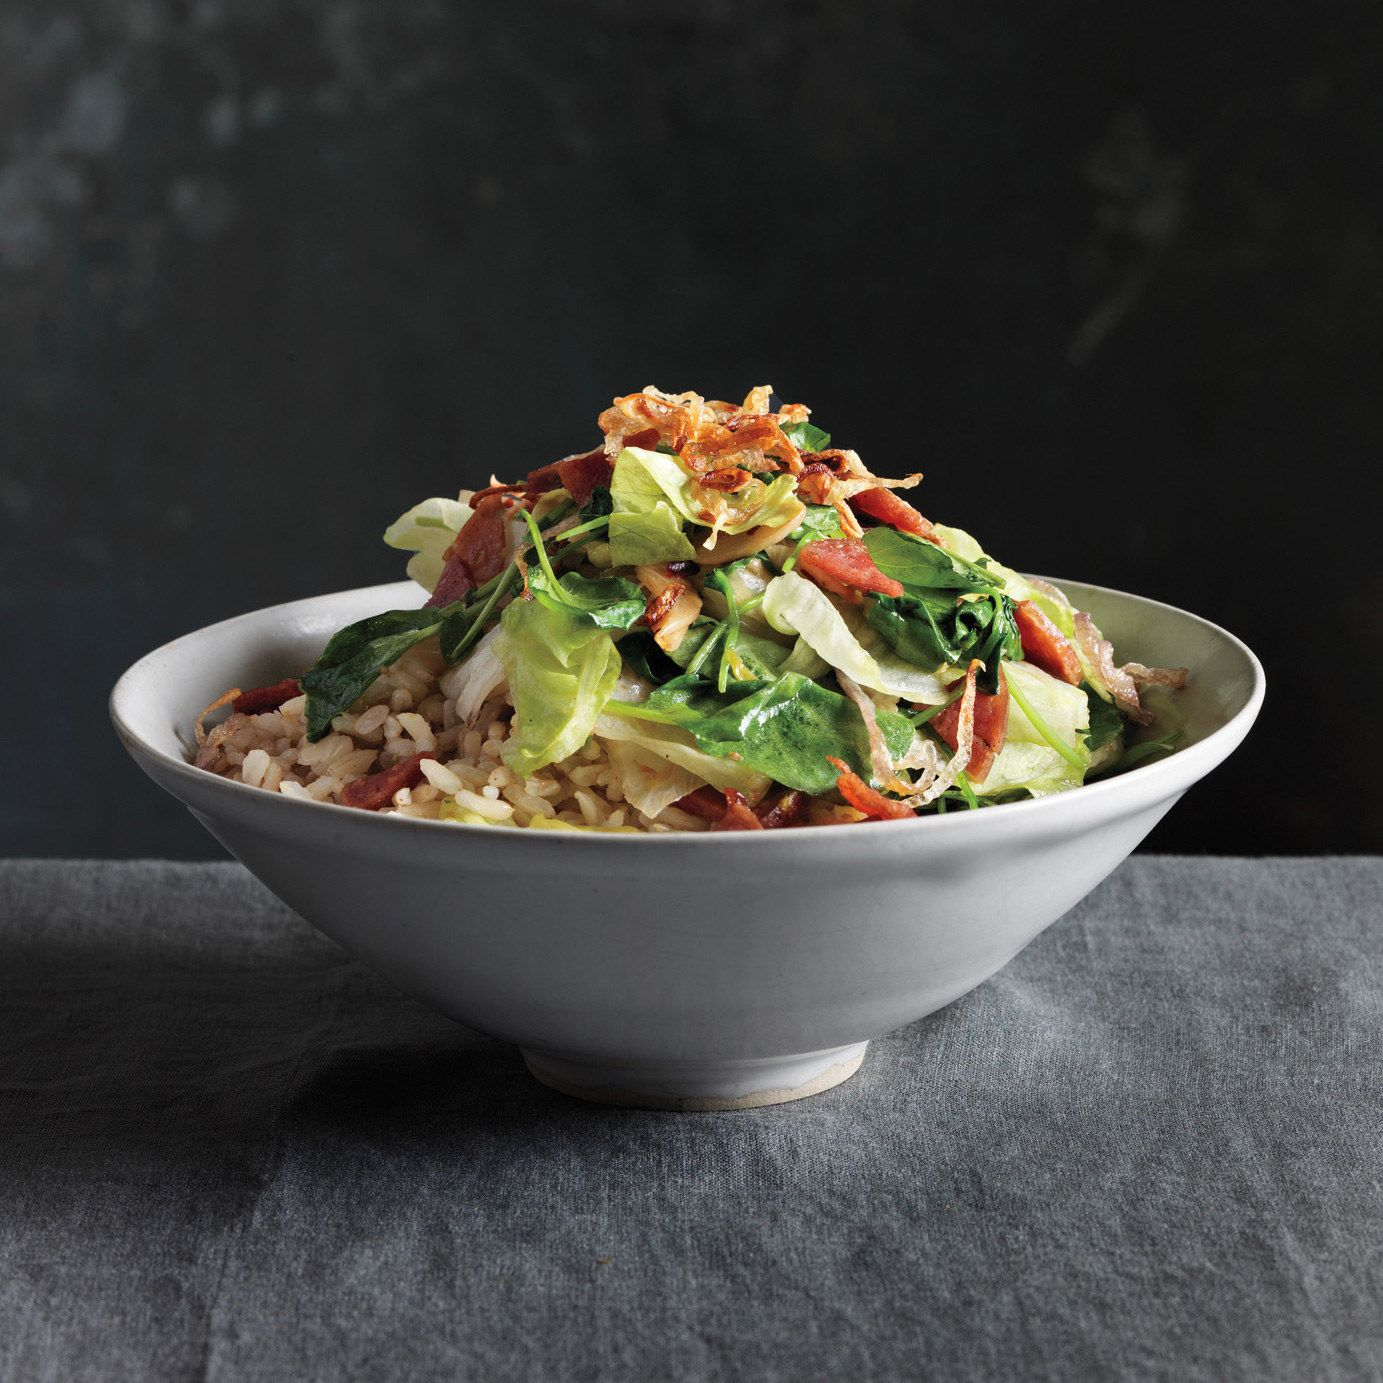 Stir-Fried Lettuces with Crispy Shallots